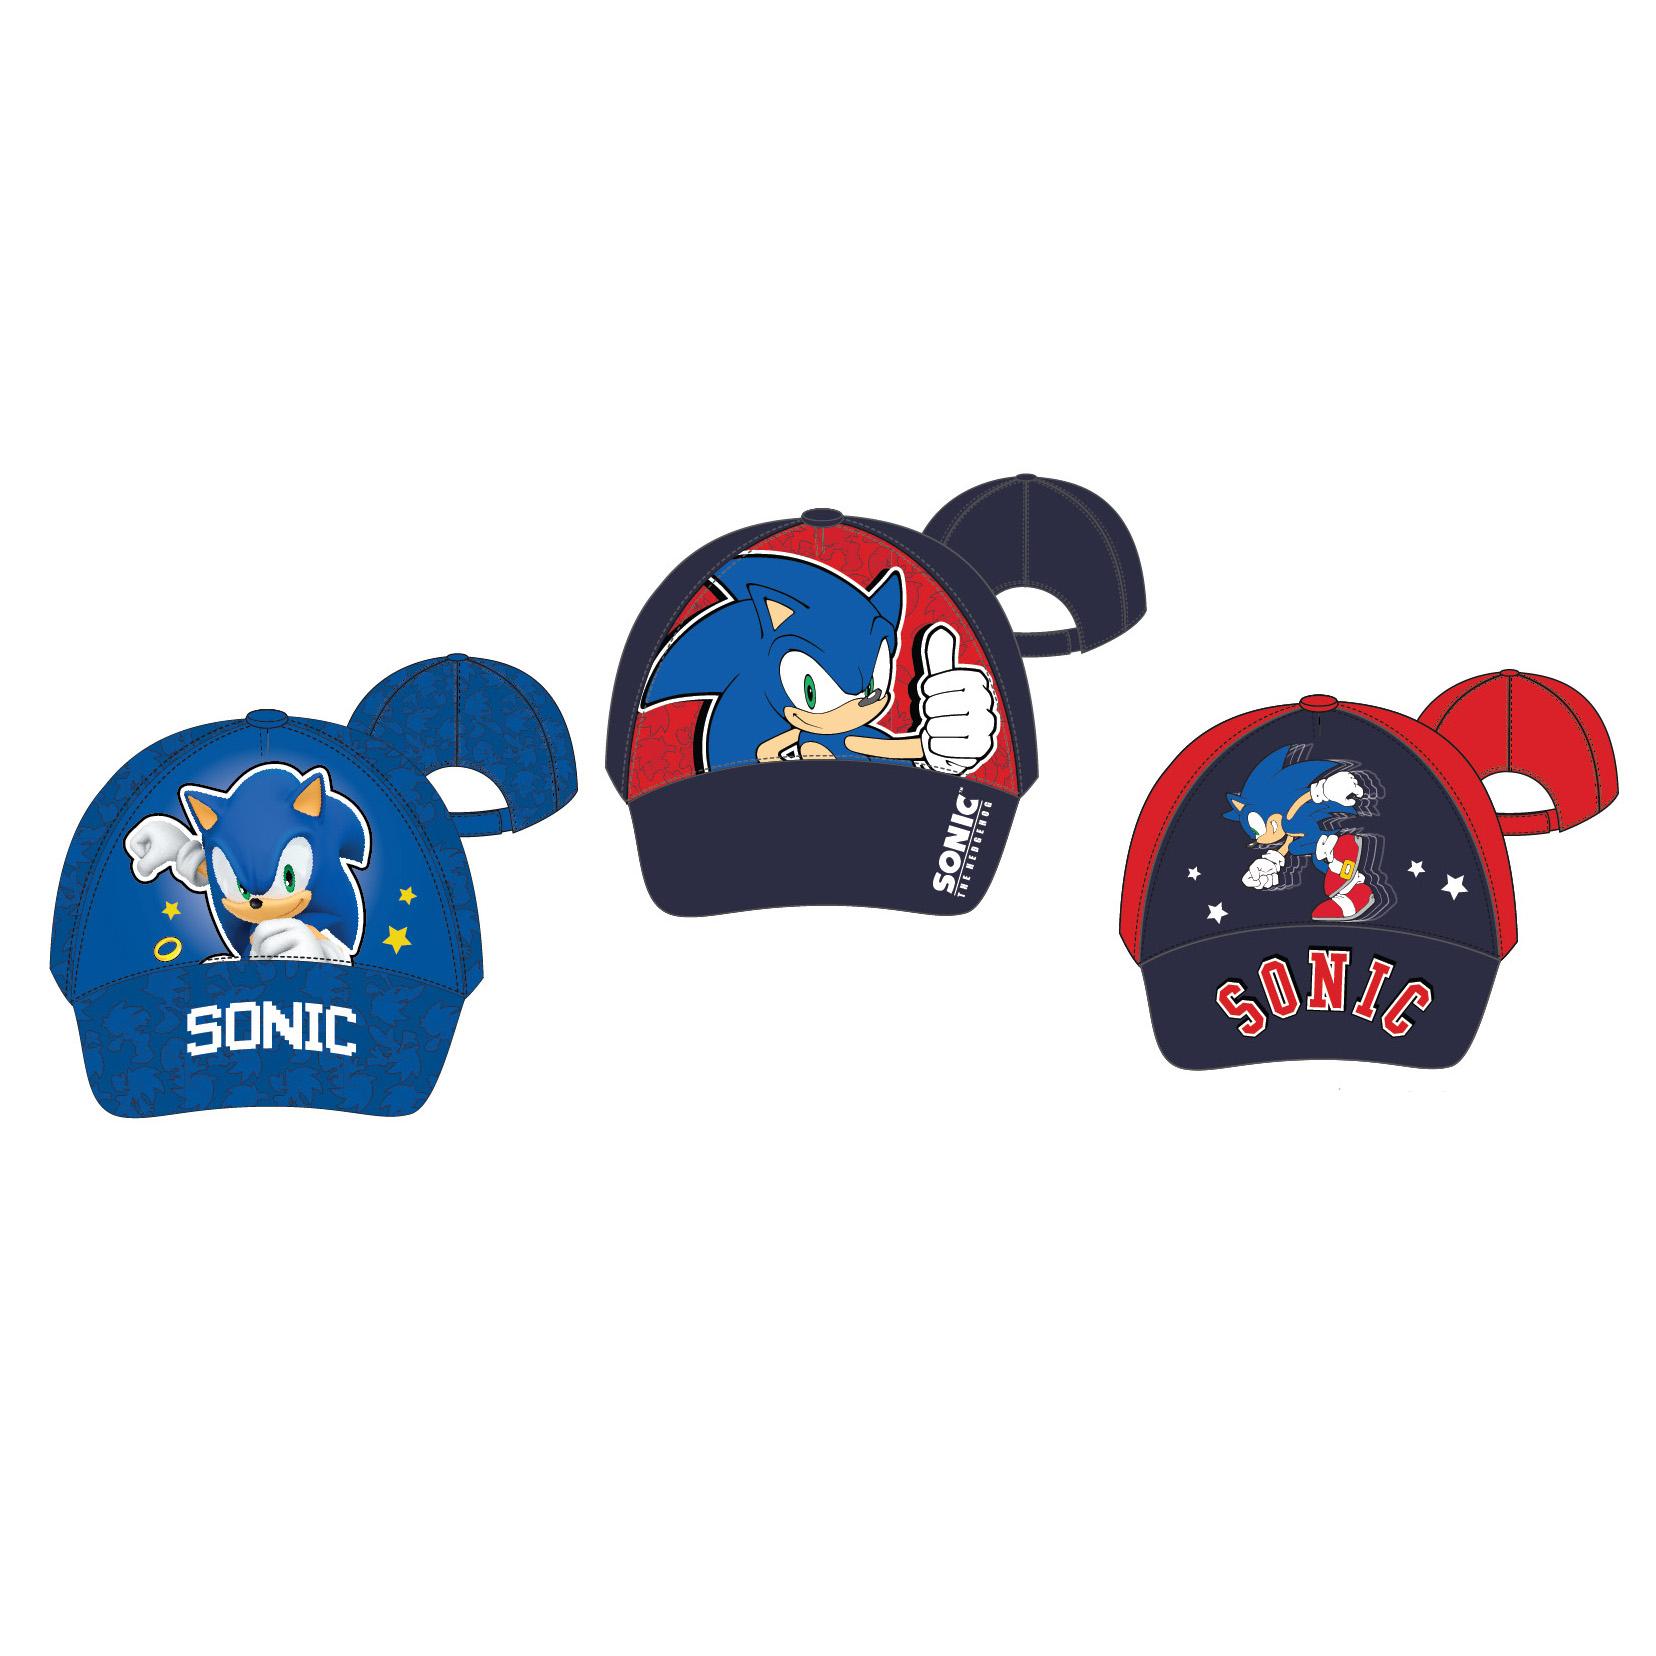 Muy Chulo Gorras Sonic Infantiles